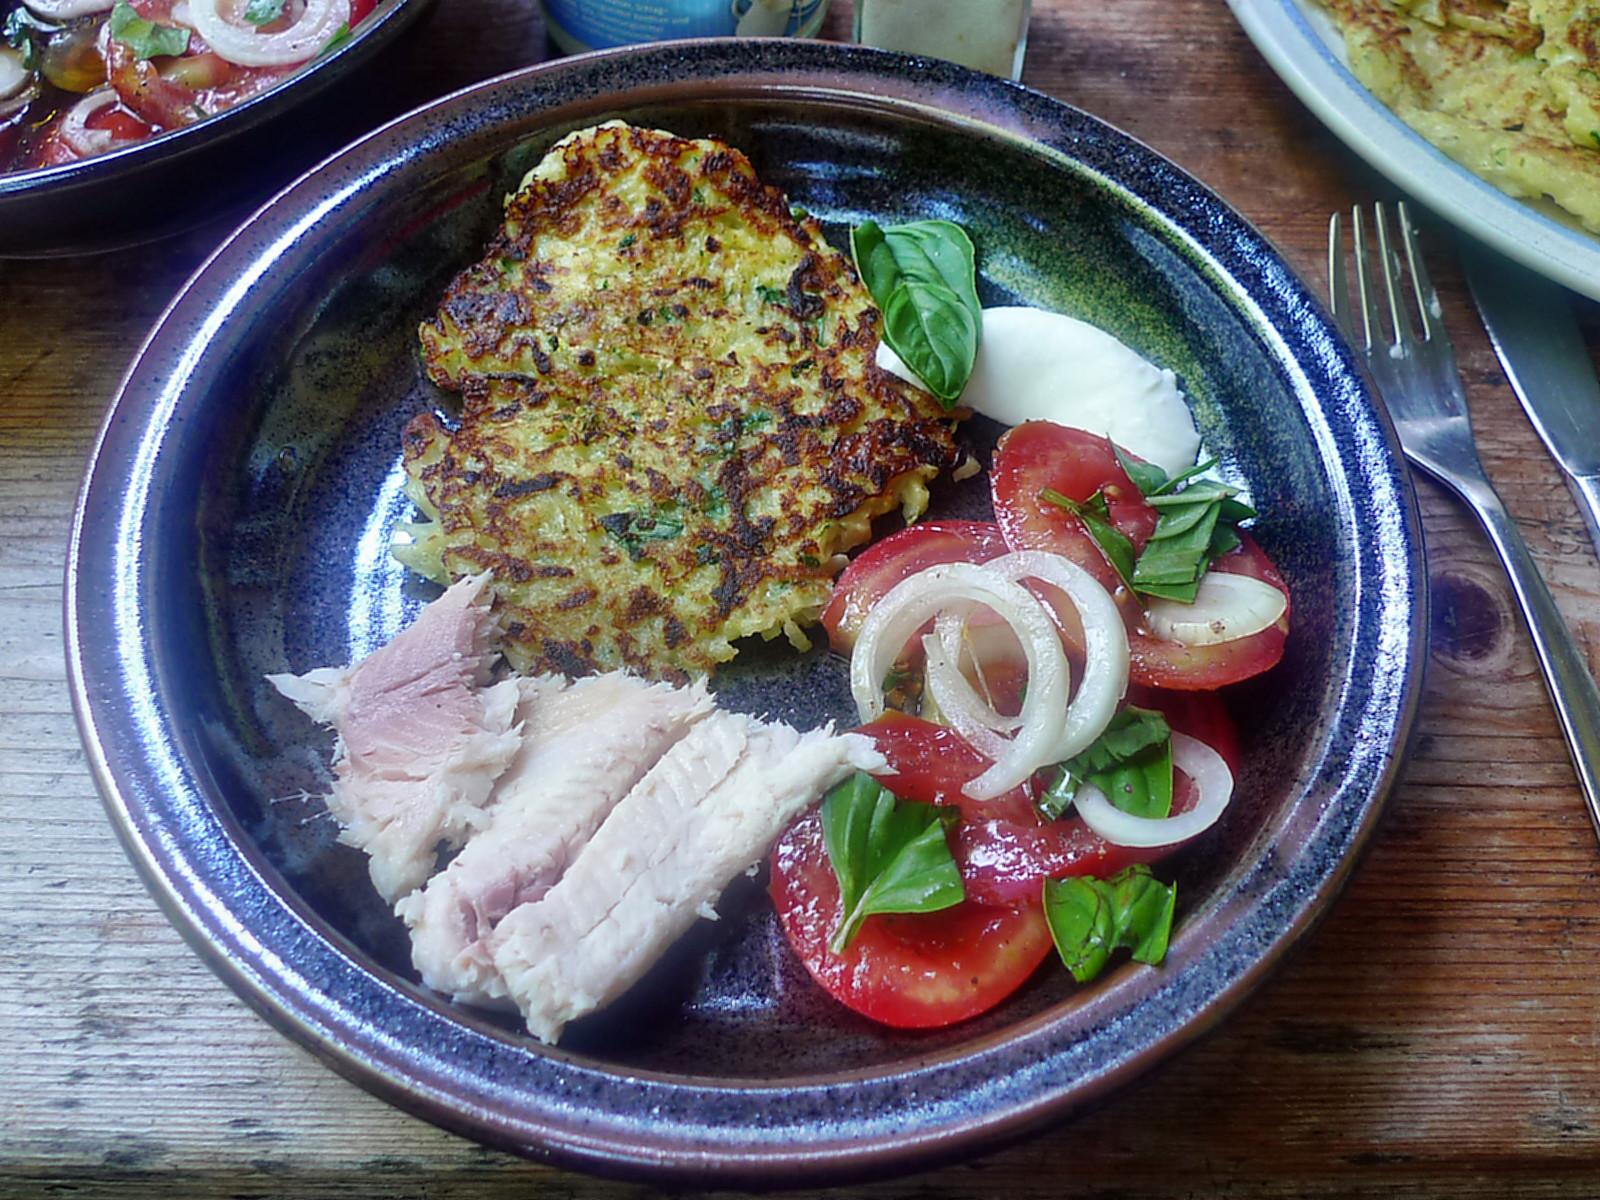 Zucchini-Kartoffelpuffer-26.7.14   (18)